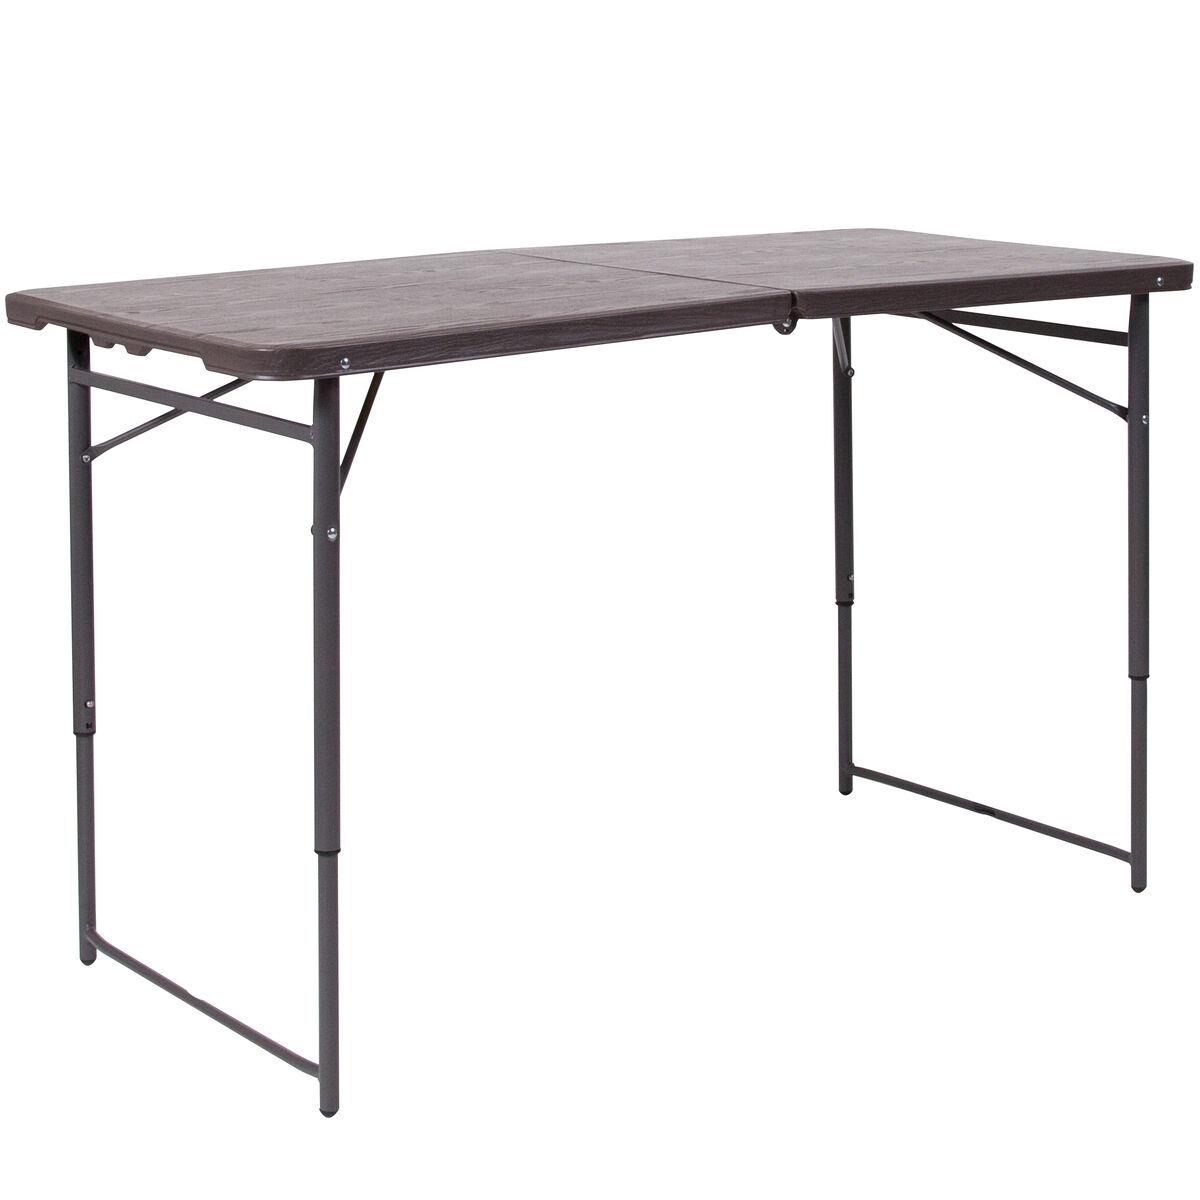 23 5x48 25 brown plastic table dad lf 122z gg churchchairs4less com